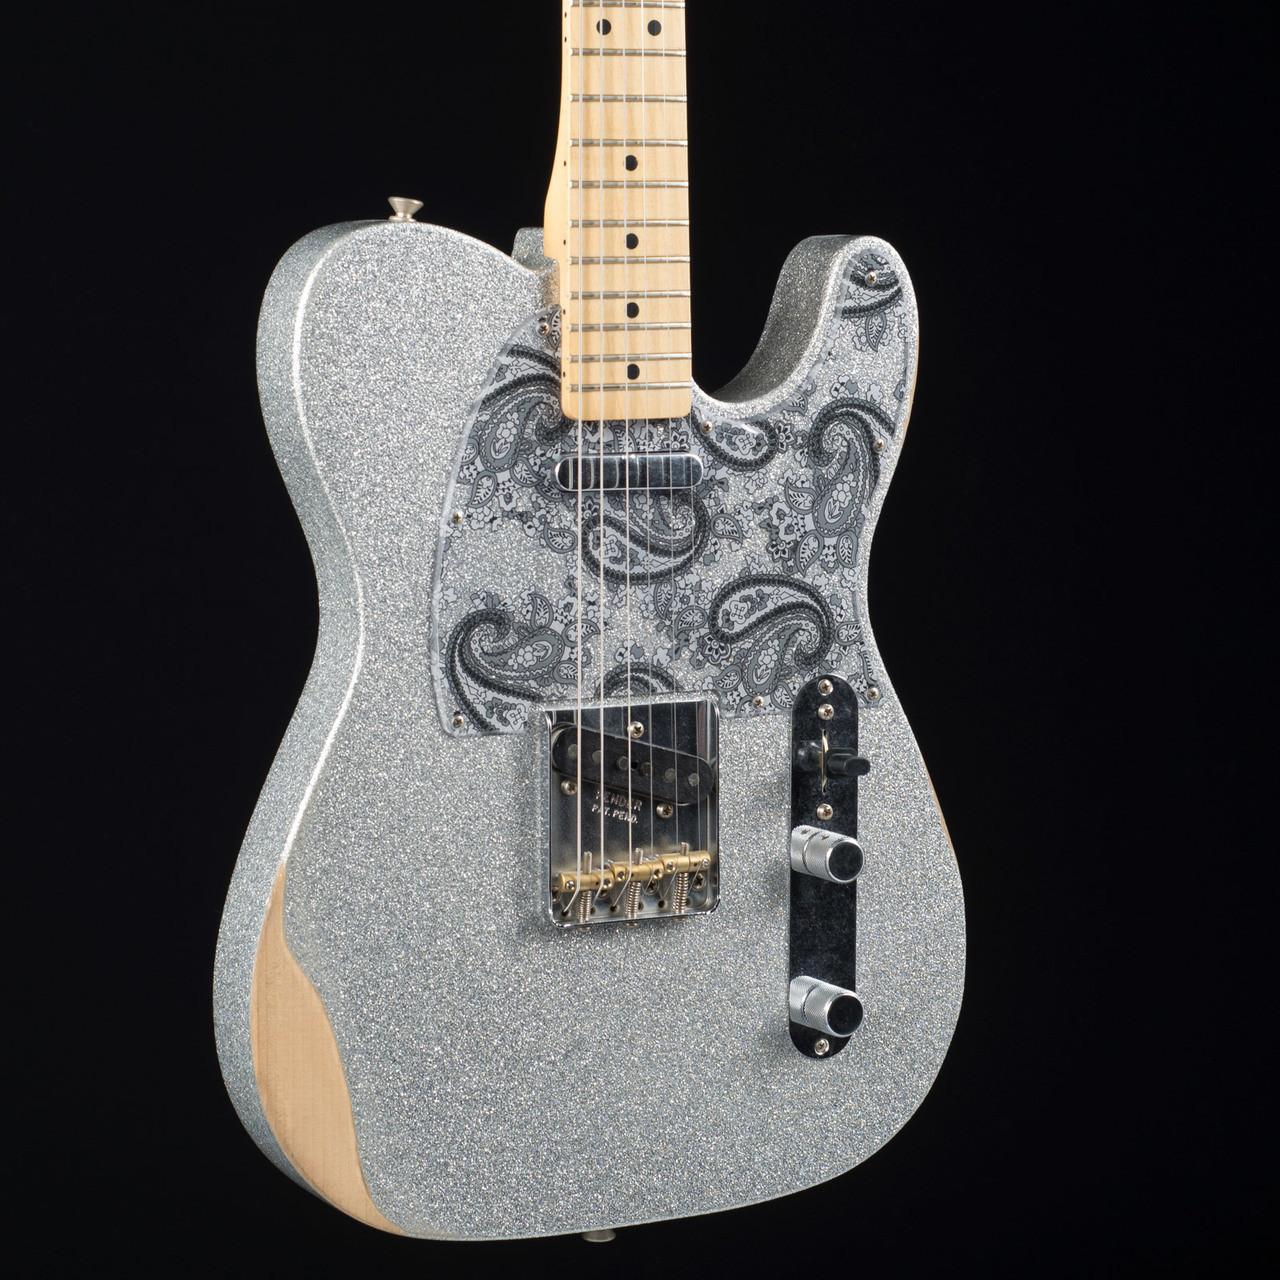 fender brad paisley road worn telecaster silver sparkle 9888 at moore music. Black Bedroom Furniture Sets. Home Design Ideas